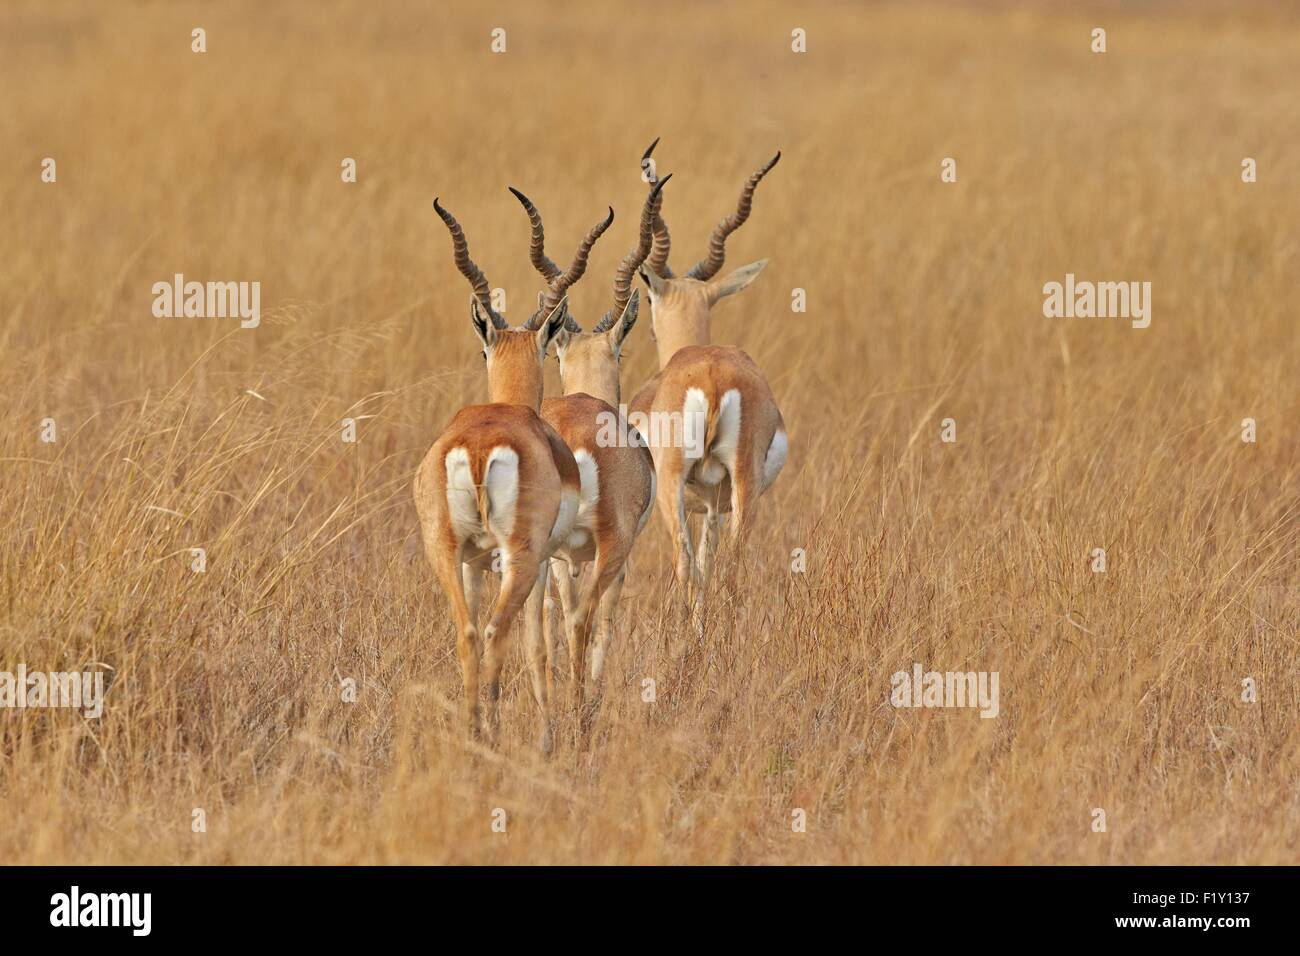 India, Gujarat state, Blackbuck national park, Blackbuck (Antilope cervicapra), male - Stock Image